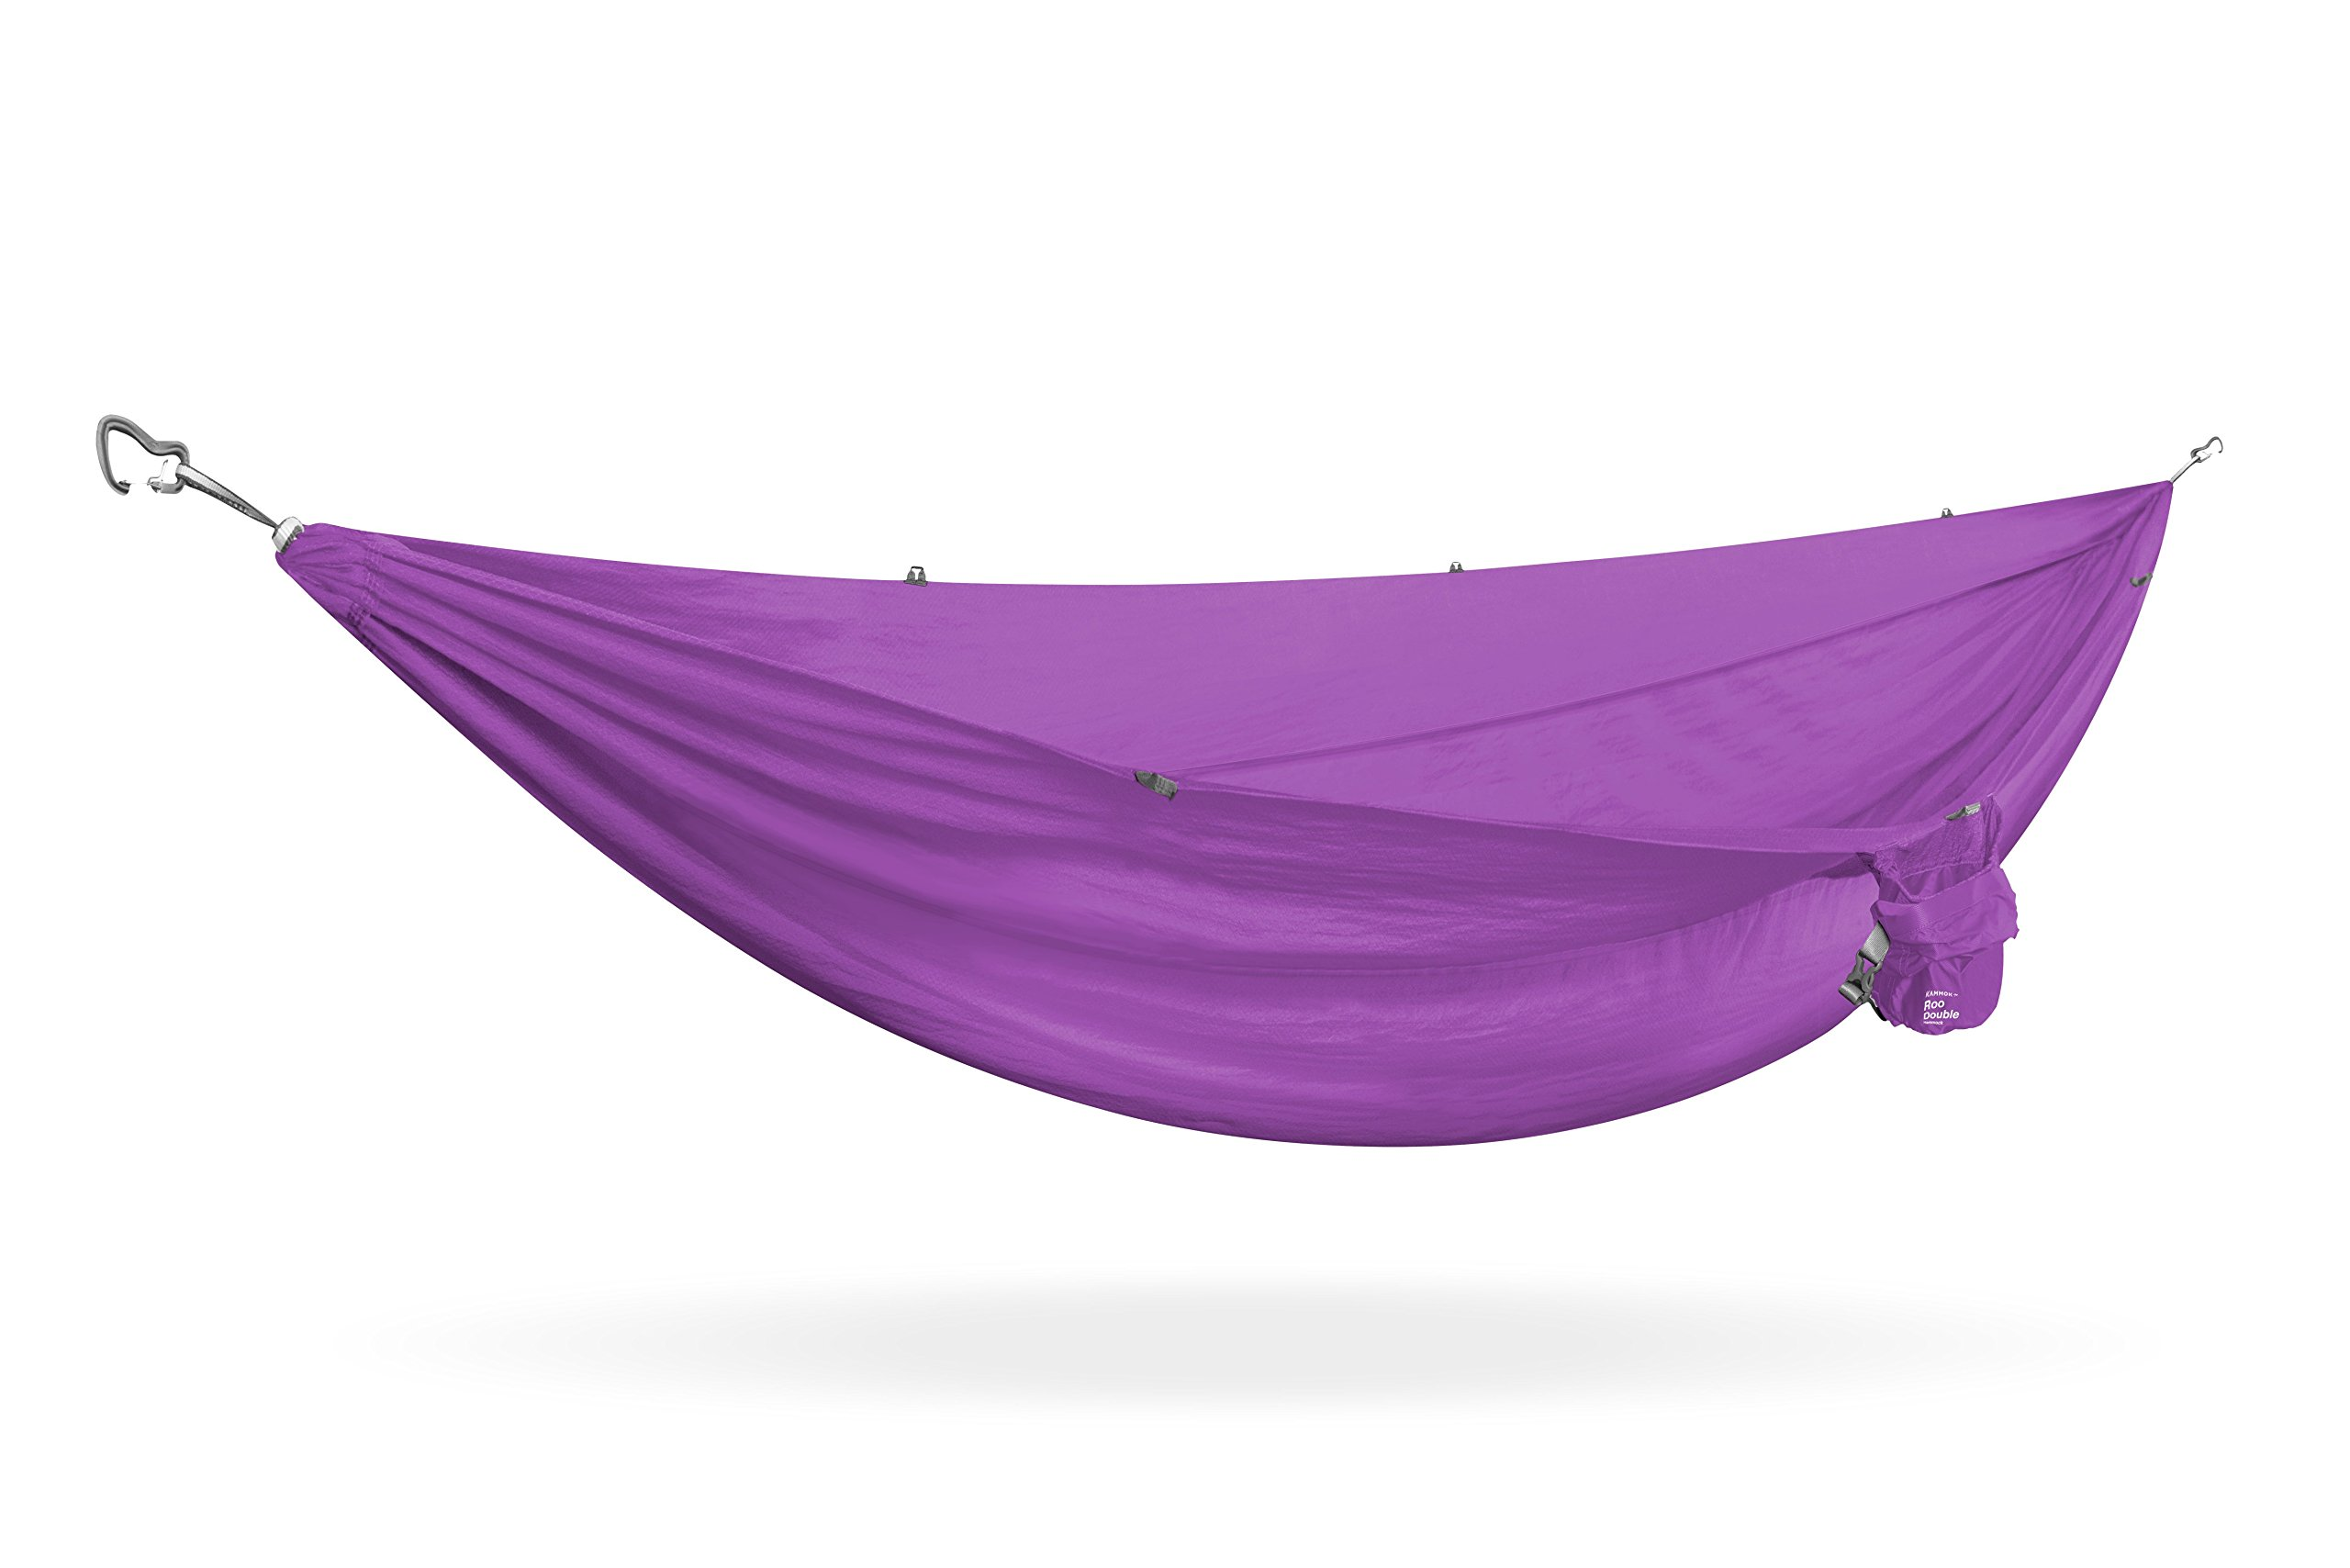 KAMMOK Roo Double Camping Hammock - Violet Purple by KAMMOK